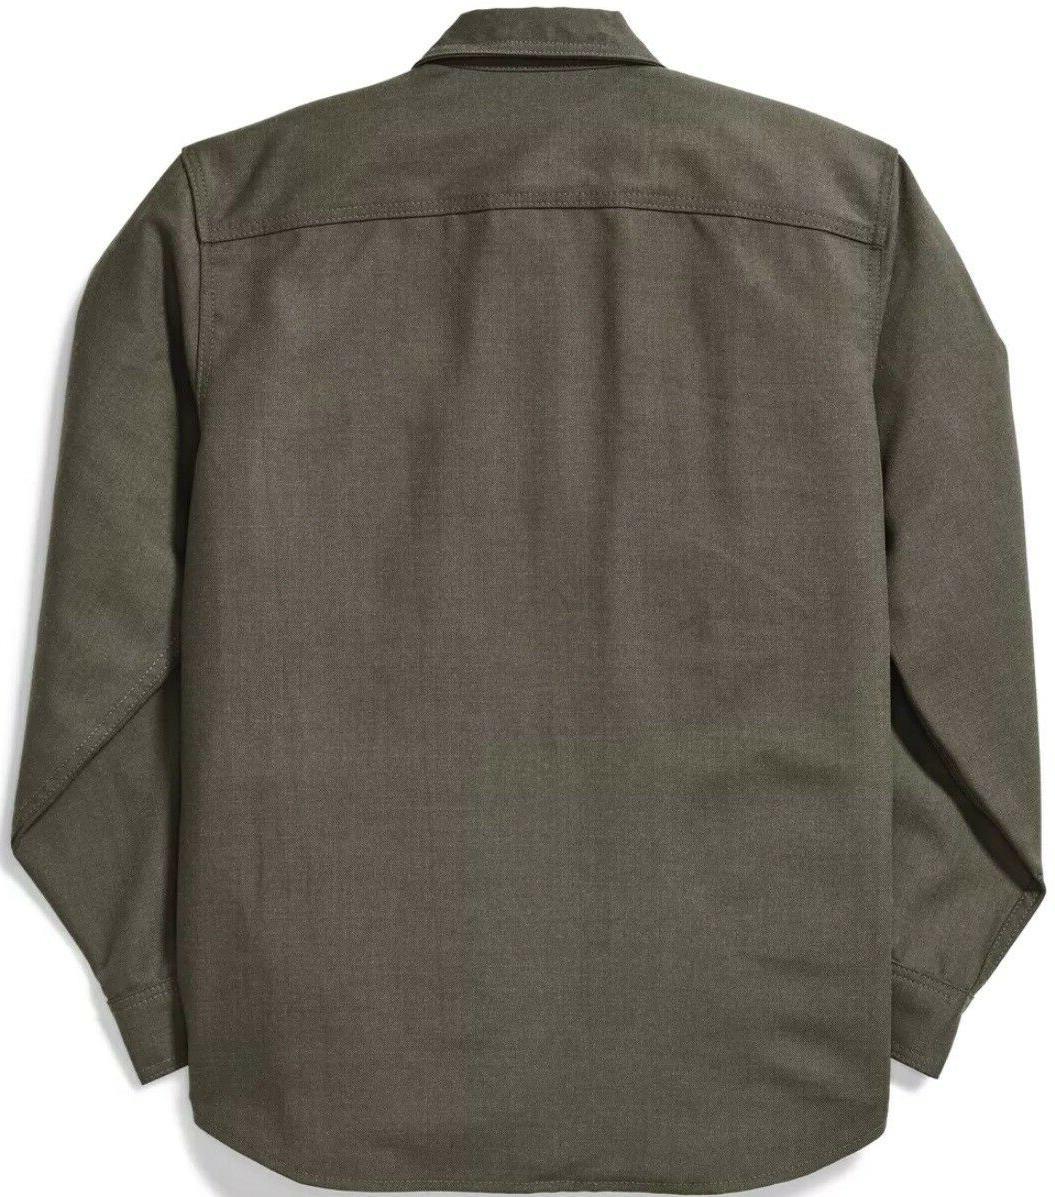 Filson Forestry Shirt Field Green 100% Wool, Men's S